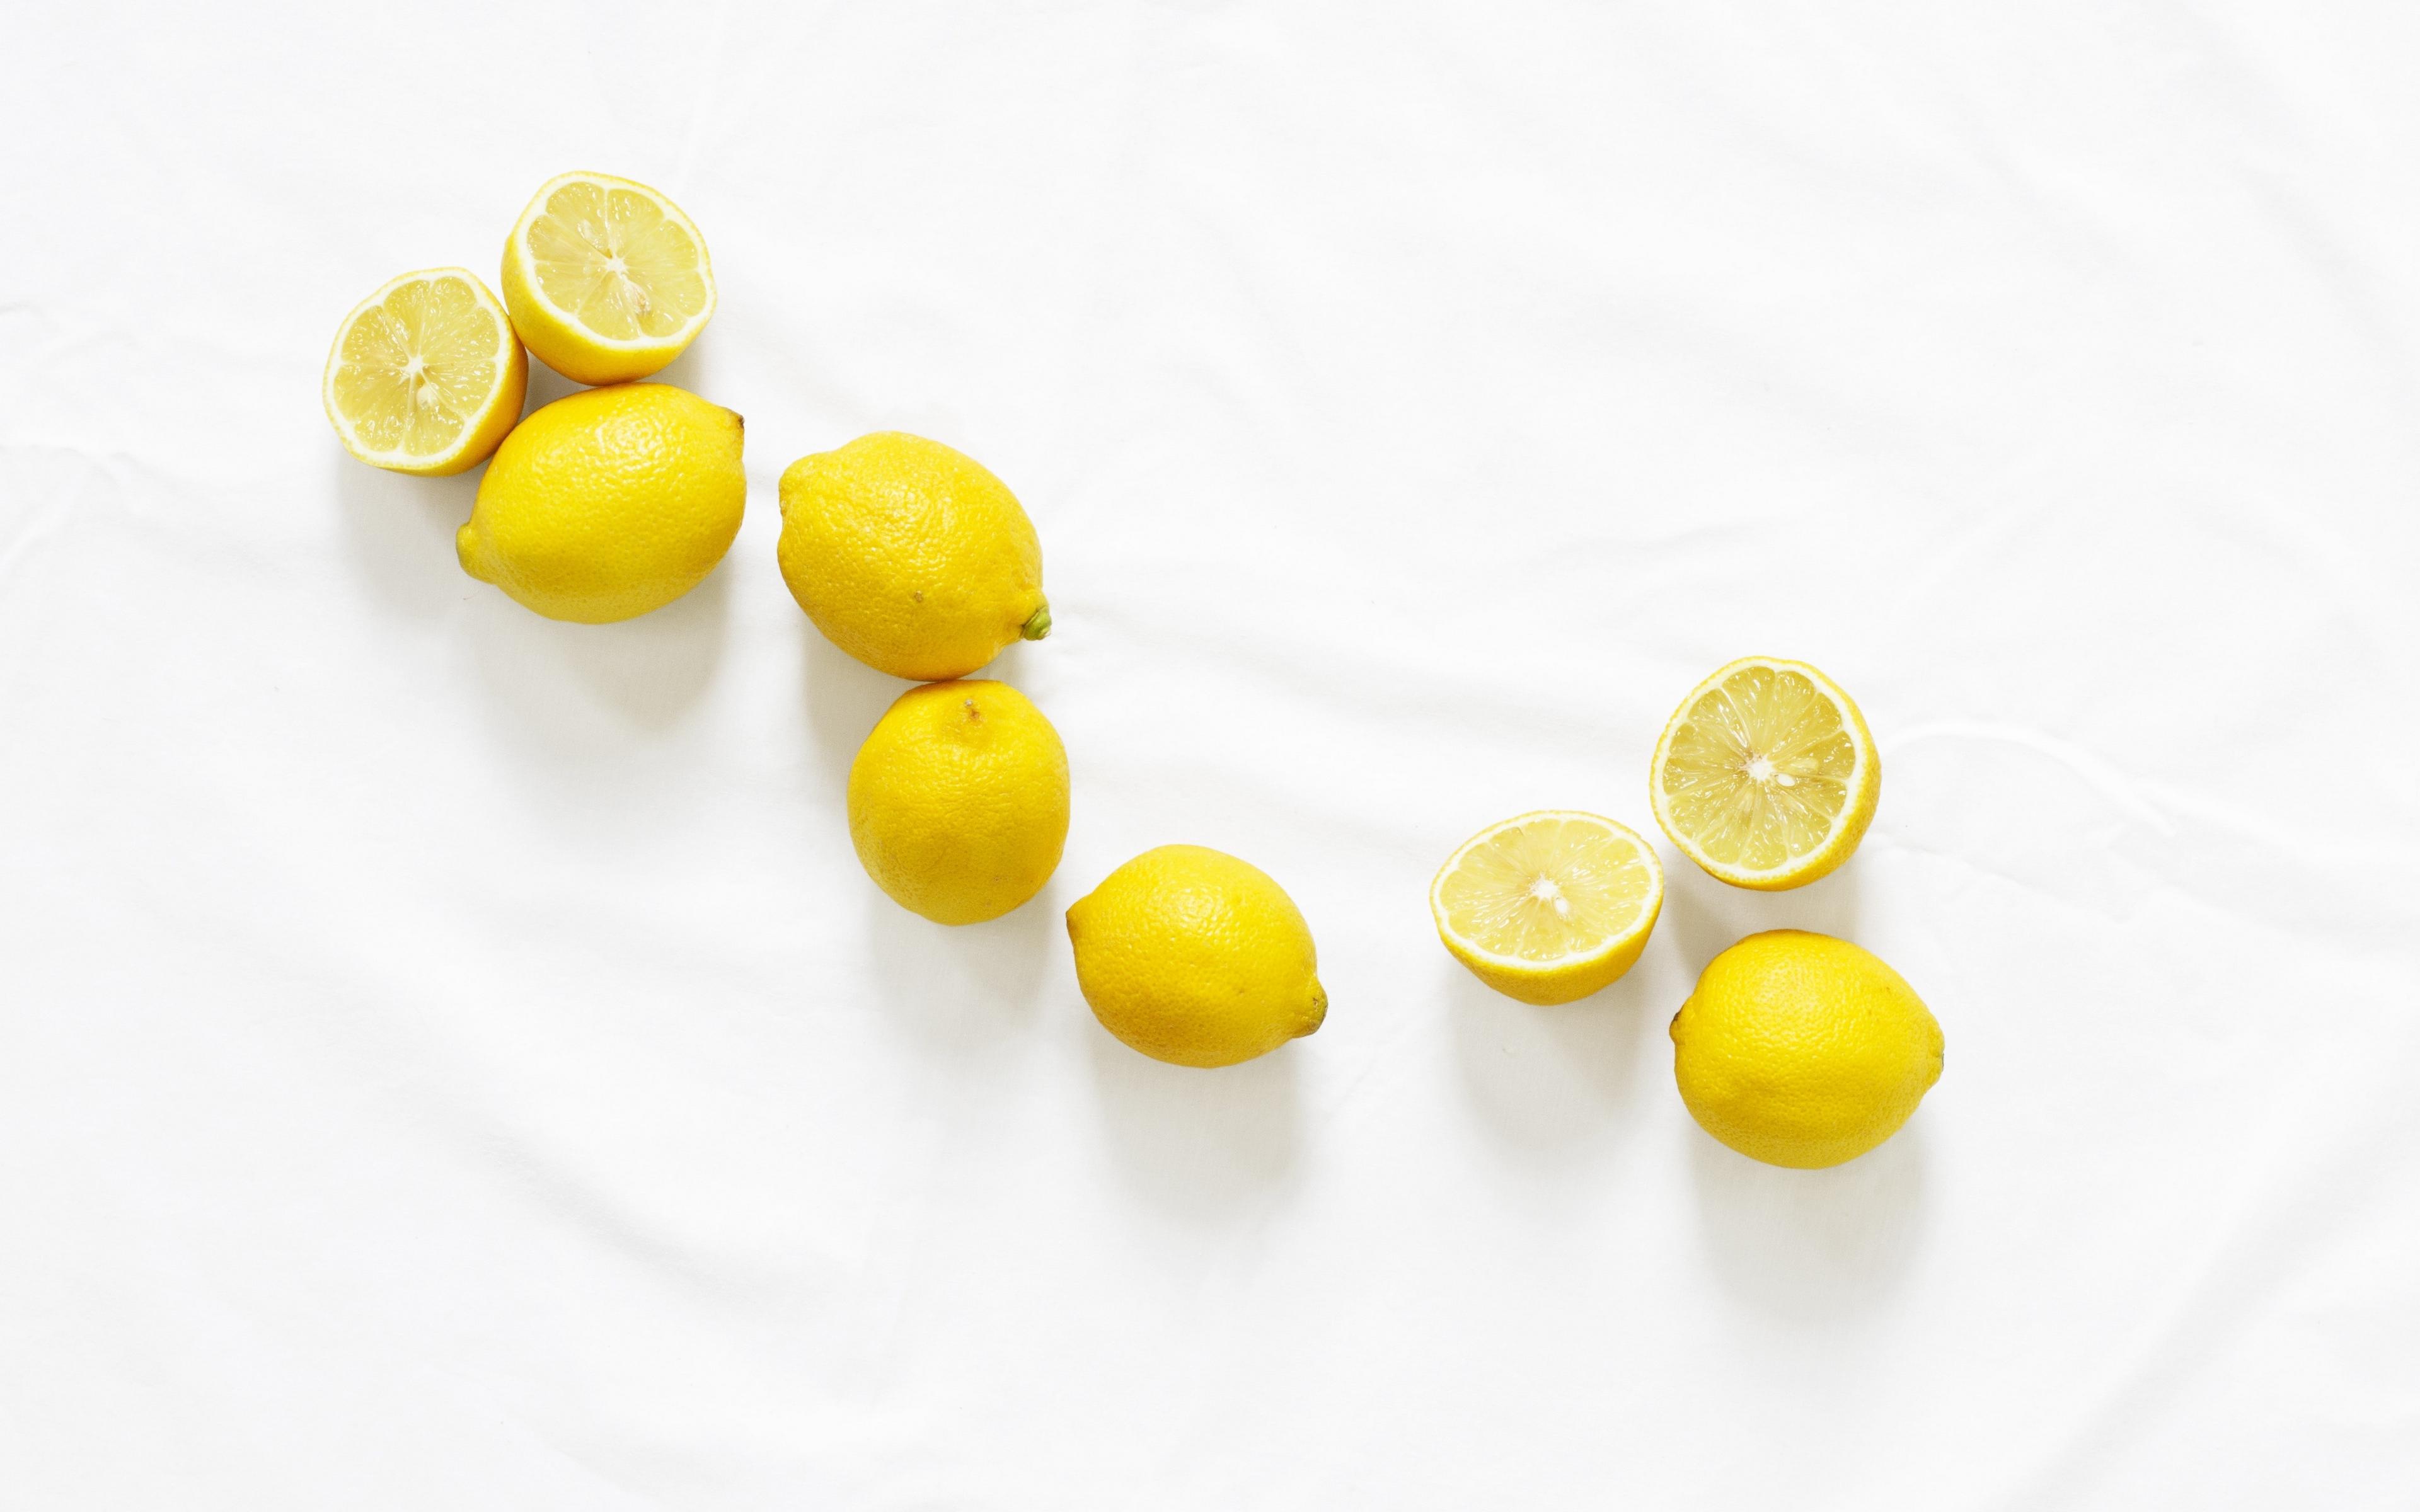 Fondos de pantalla Limones en fondo blanco